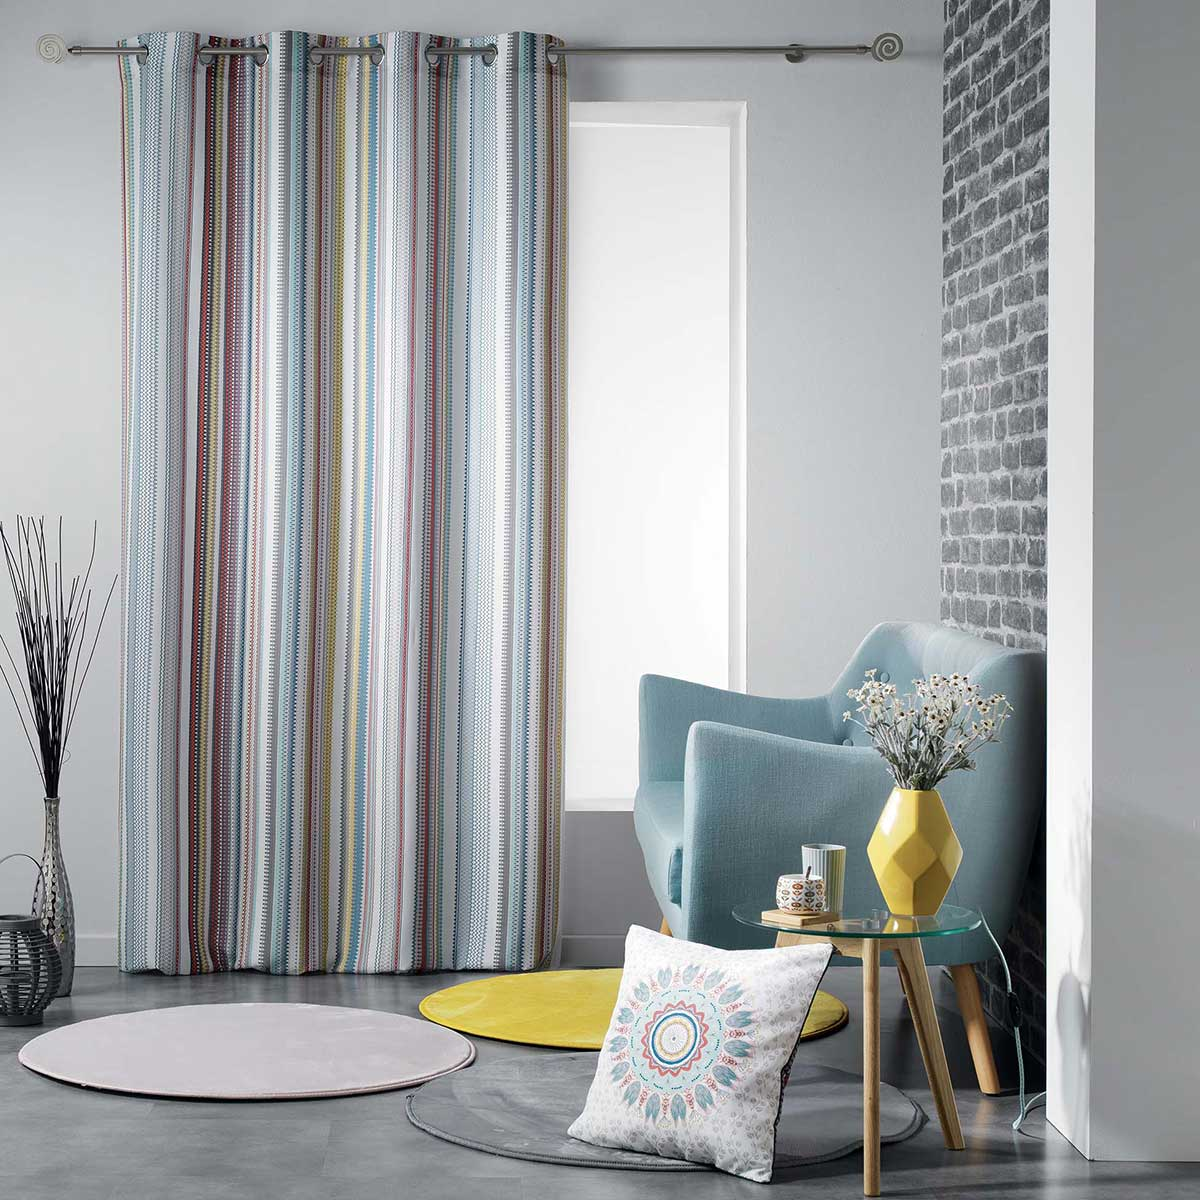 Rideau tamisant à l'esprit hispanisant - Multicolore - 140 x 260 cm